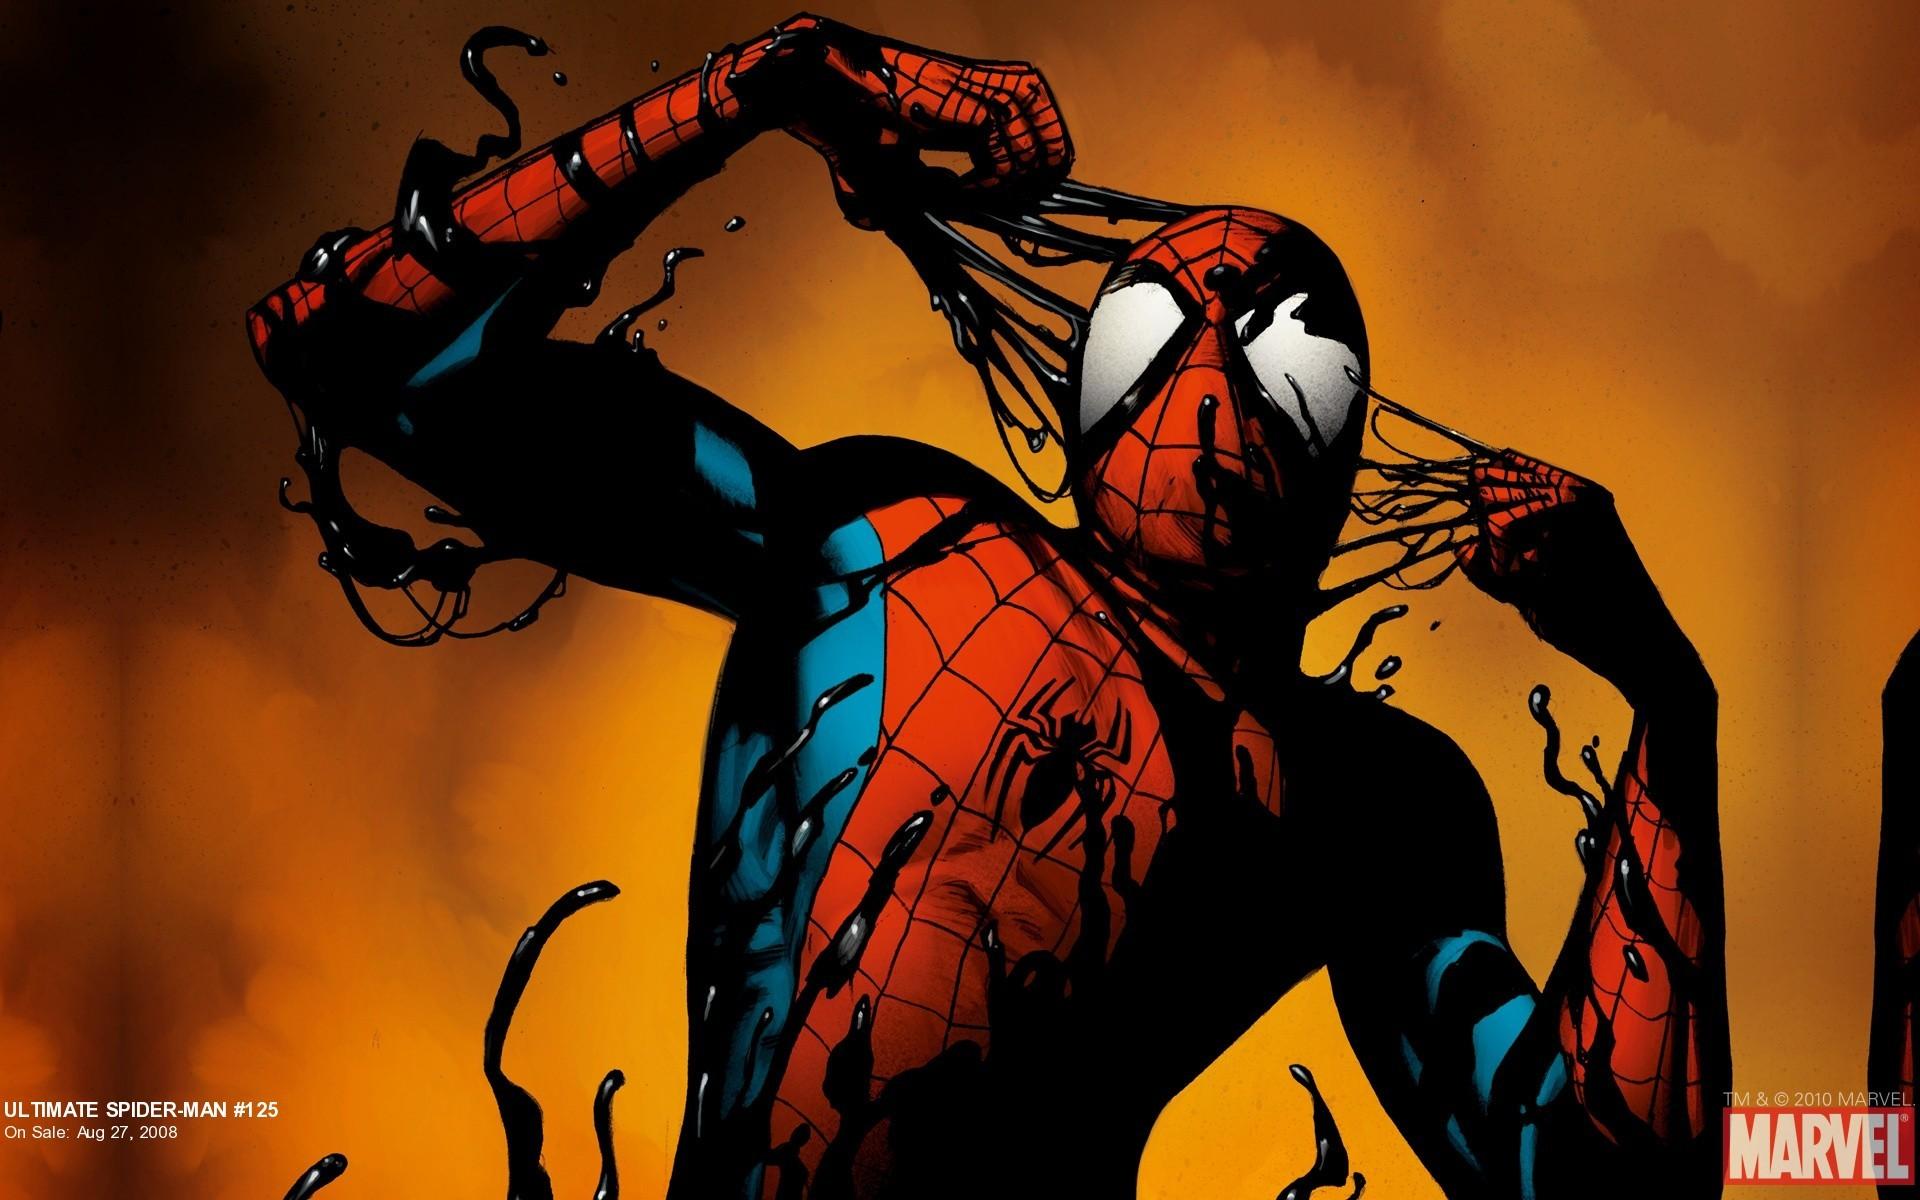 Ultimate Spider-Man #125 Wallpaper